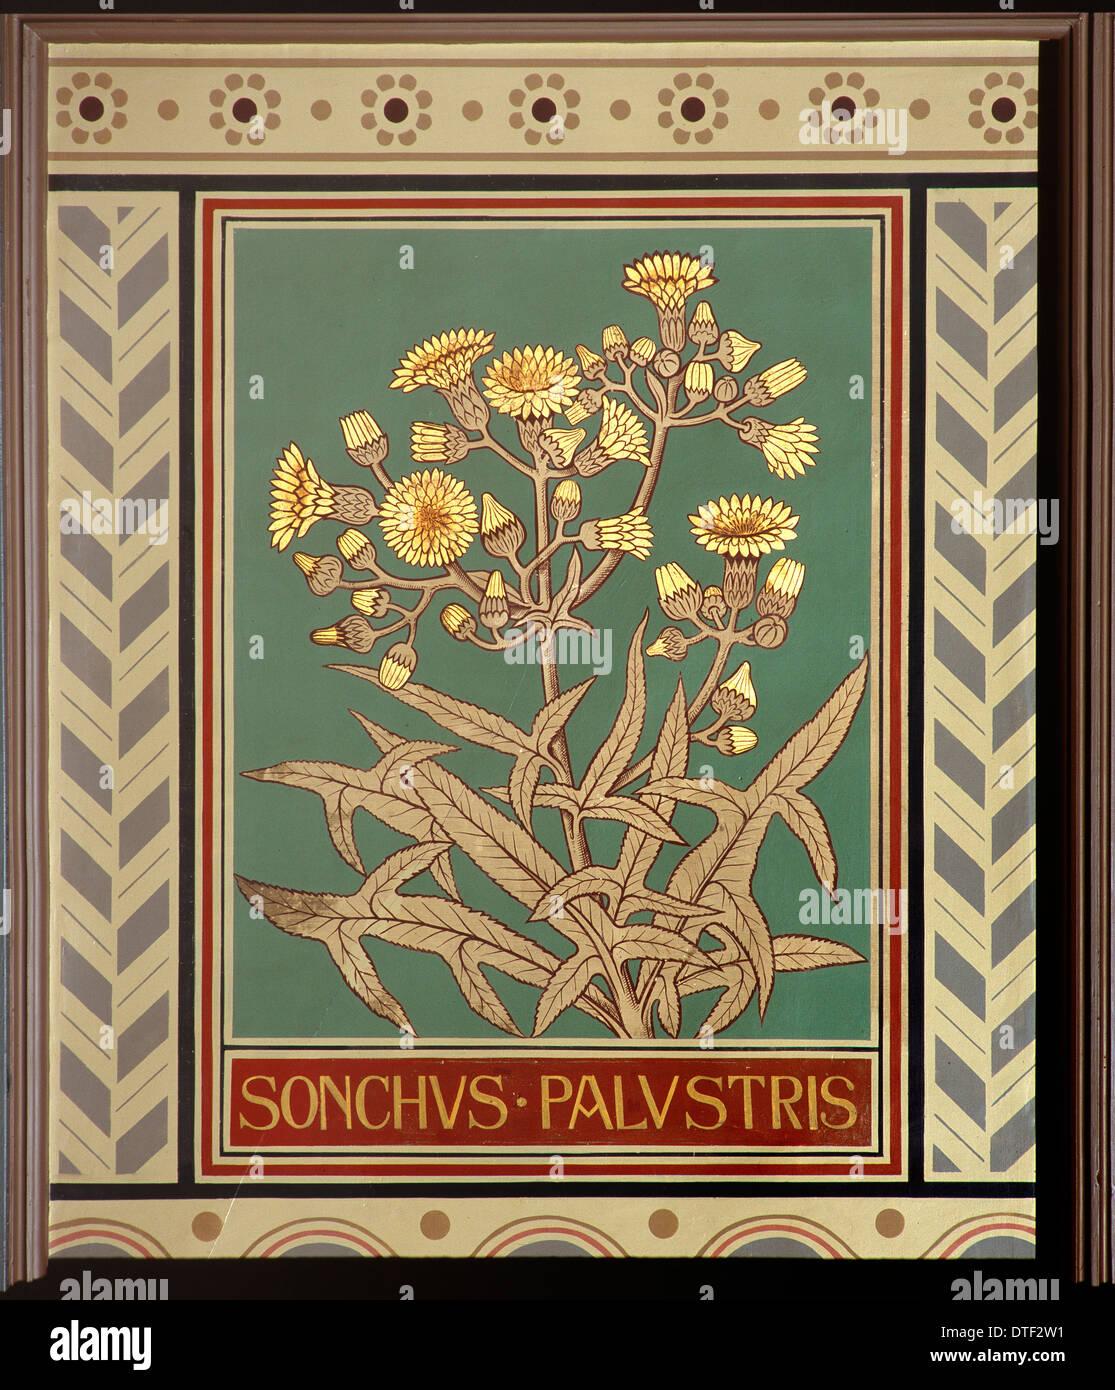 Sonchus palustris, marsh sow-thistle - Stock Image